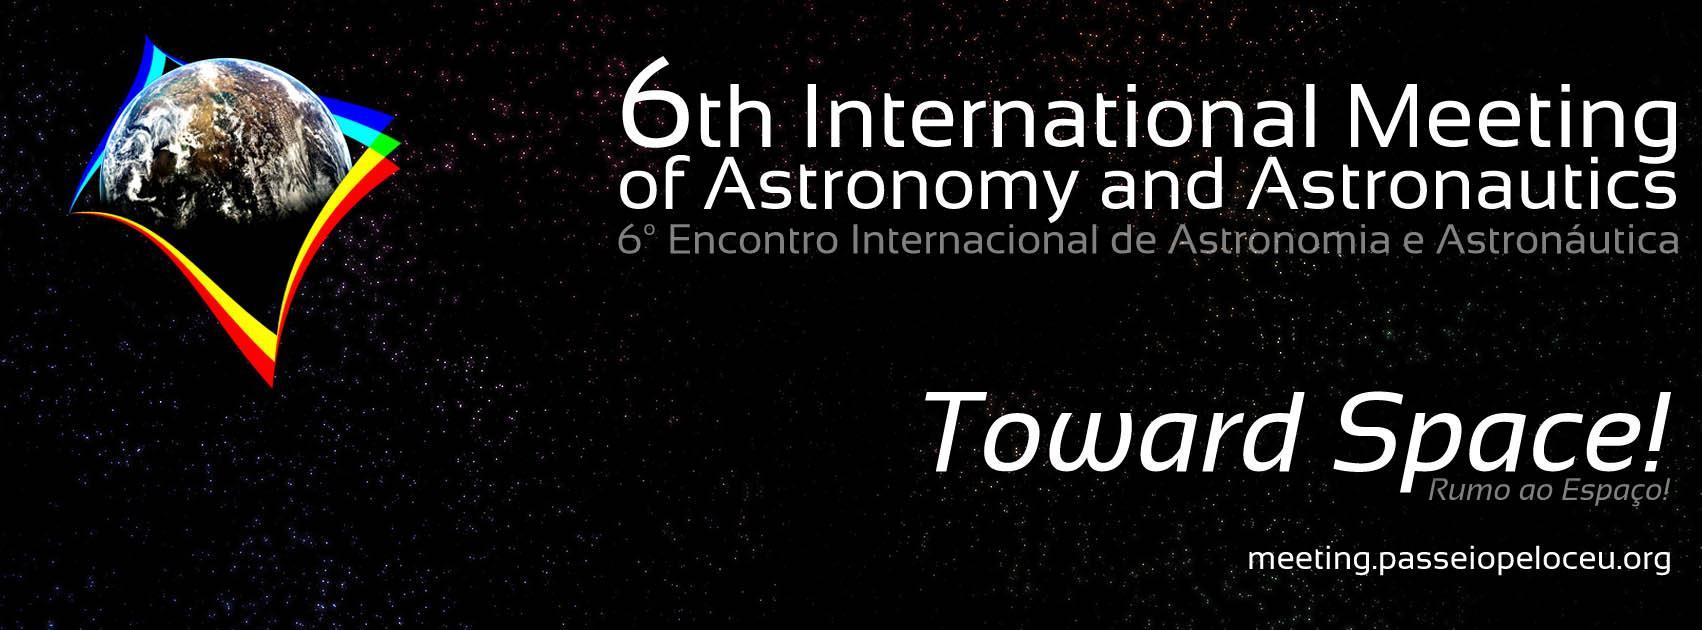 6th International Meeting of Astronomy and Astronautics